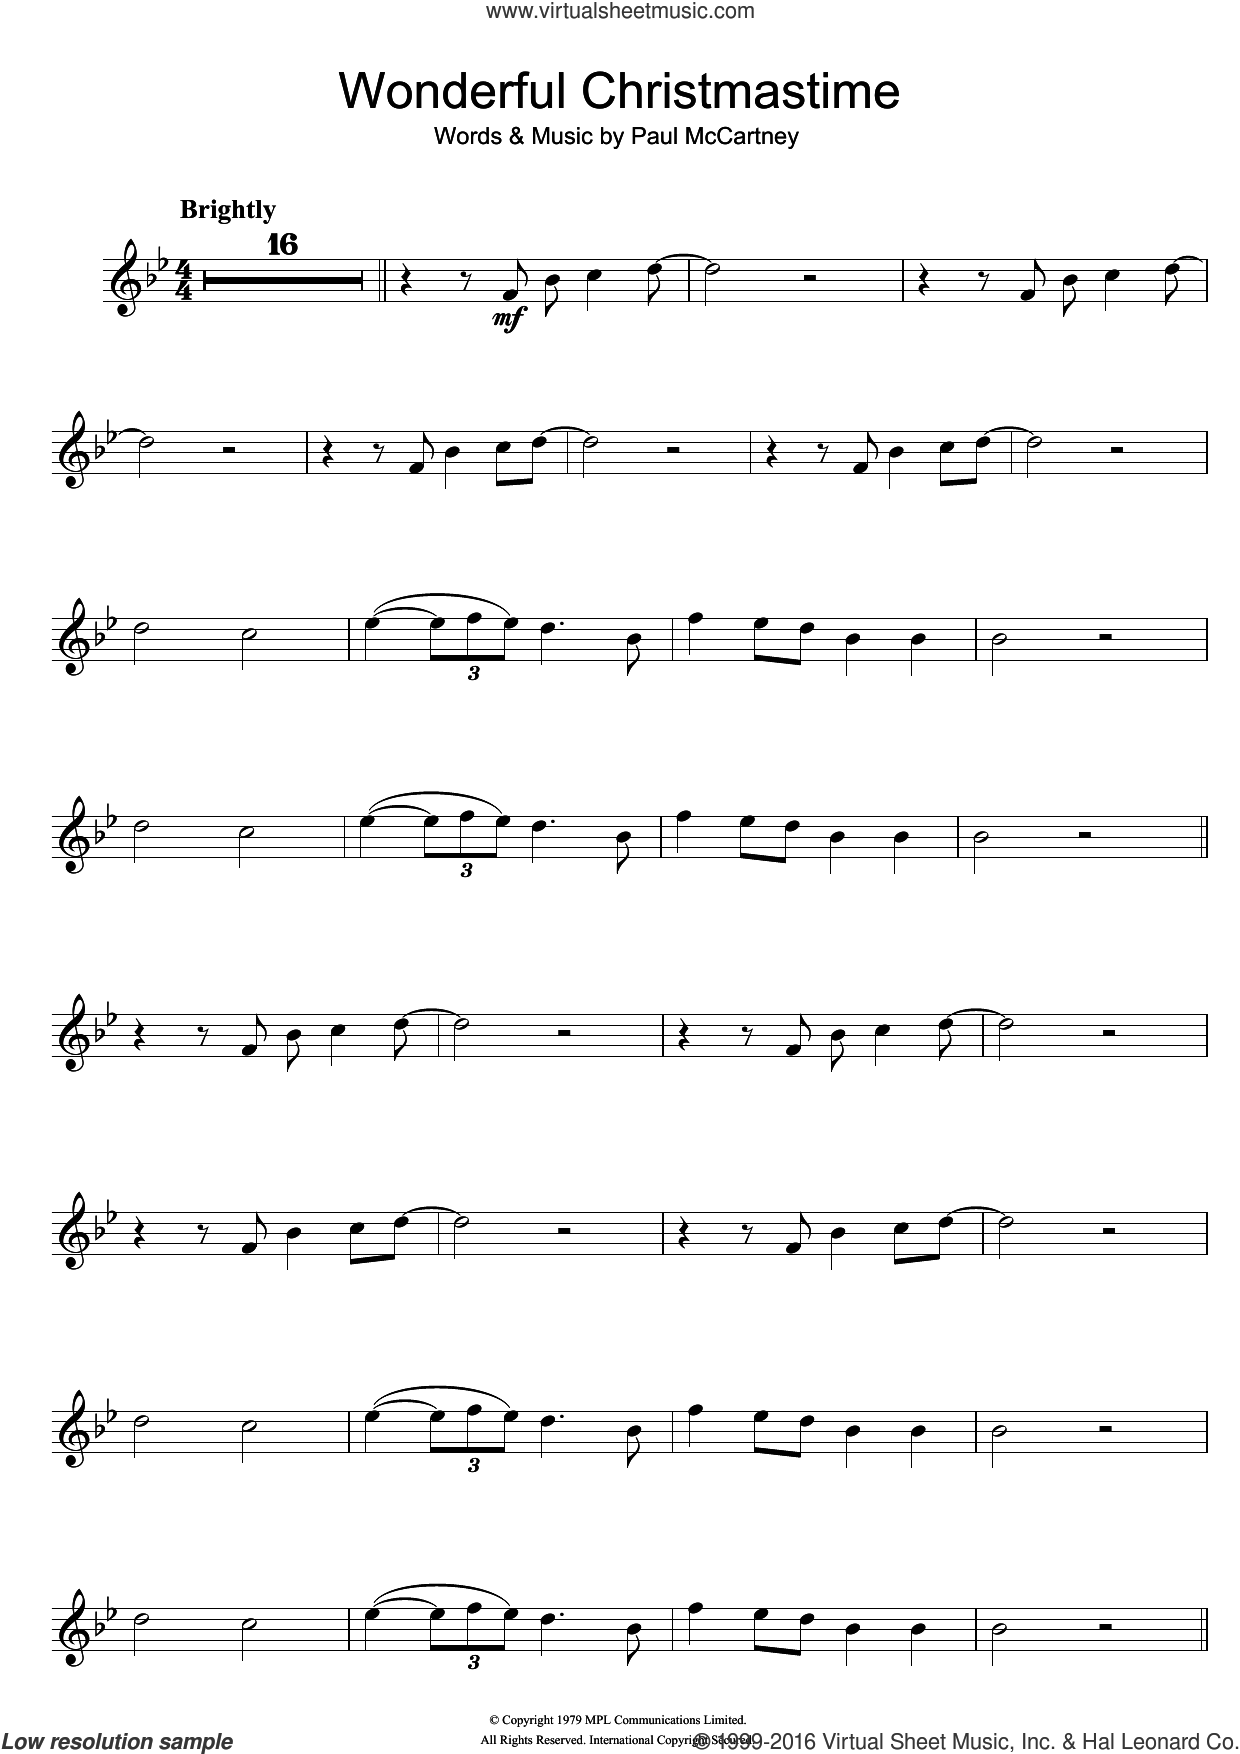 Wonderful Christmastime sheet music for violin solo by Paul McCartney, intermediate skill level